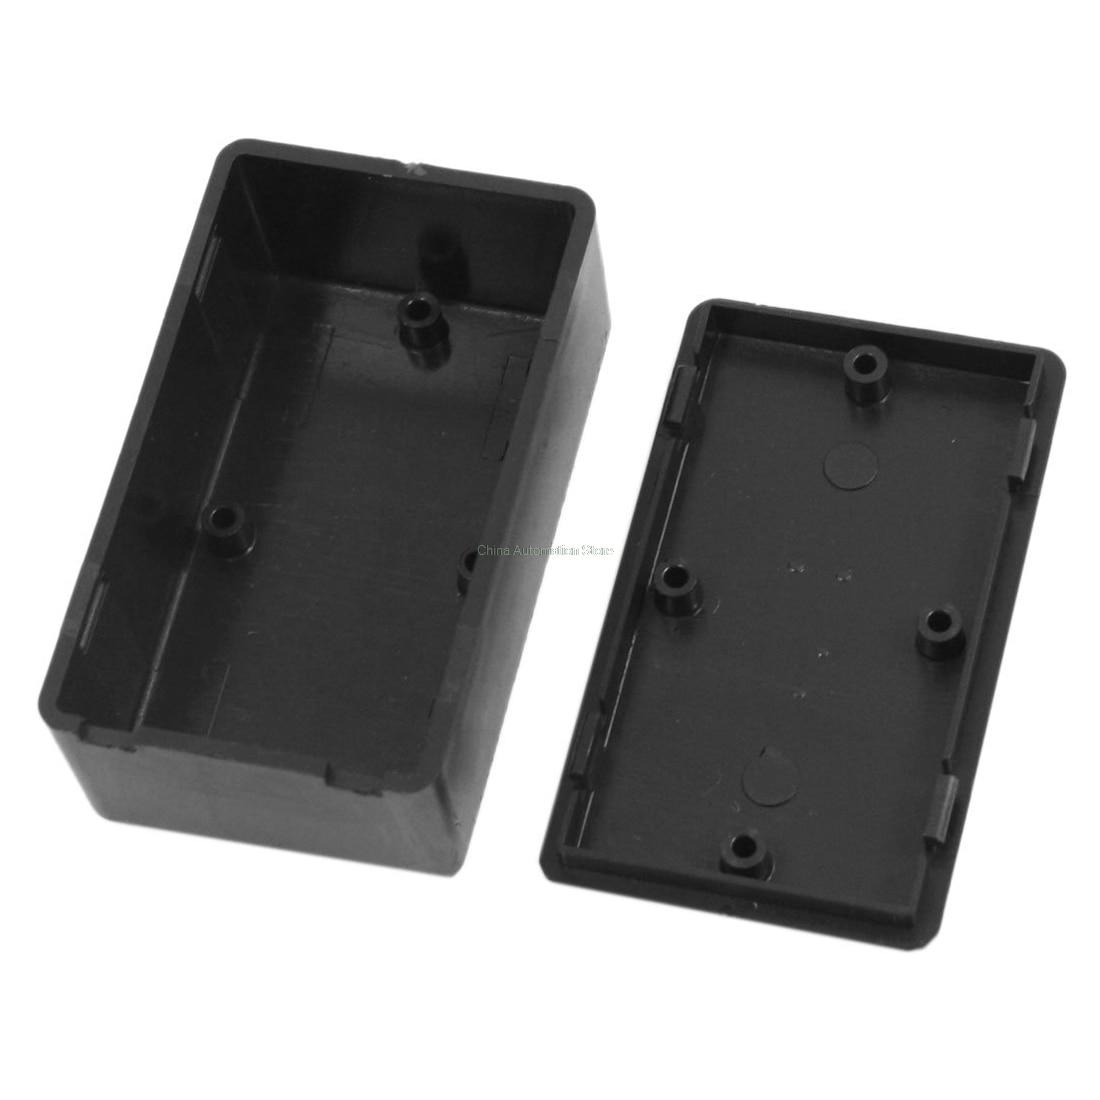 IMC Hot 5pcs Waterproof Plastic Electric Project Junction Box 60x36x25mm